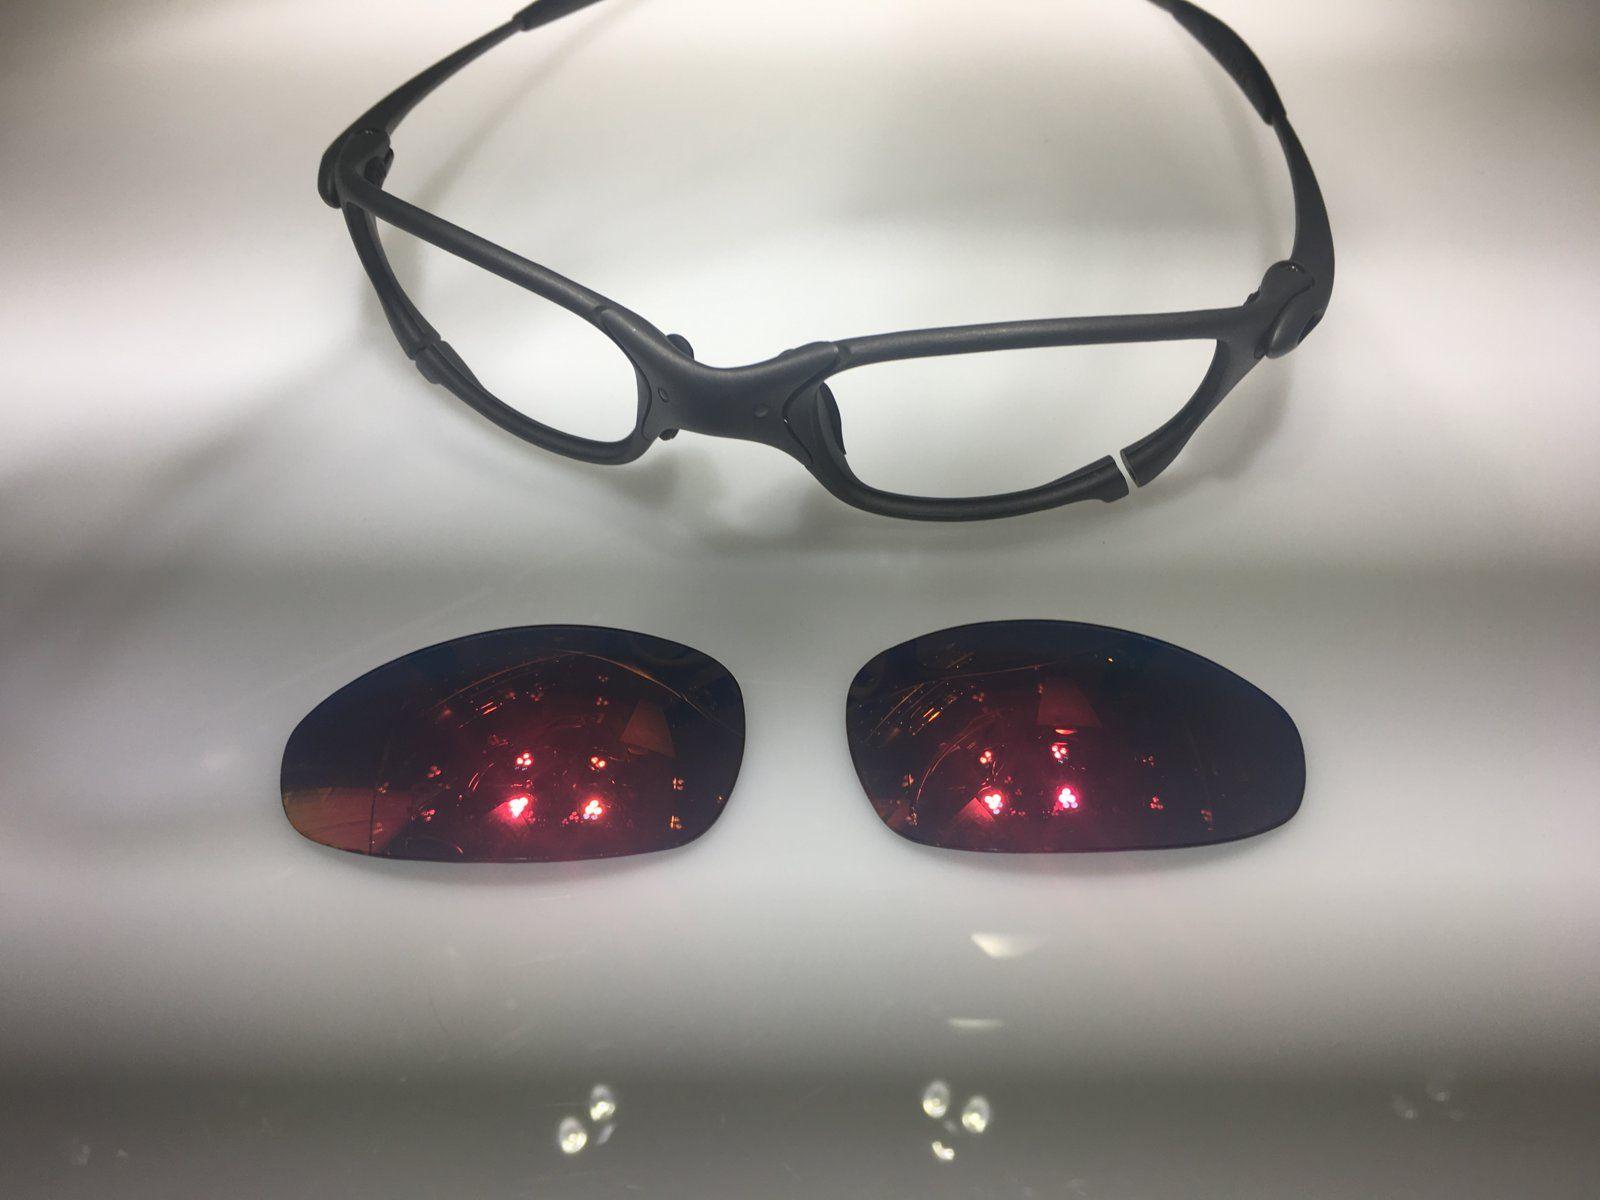 8e31c33624d Juliet Deep Ruby lenses - 815ADE75-A01C-449C-A192-08017BB23D89.jpeg ...